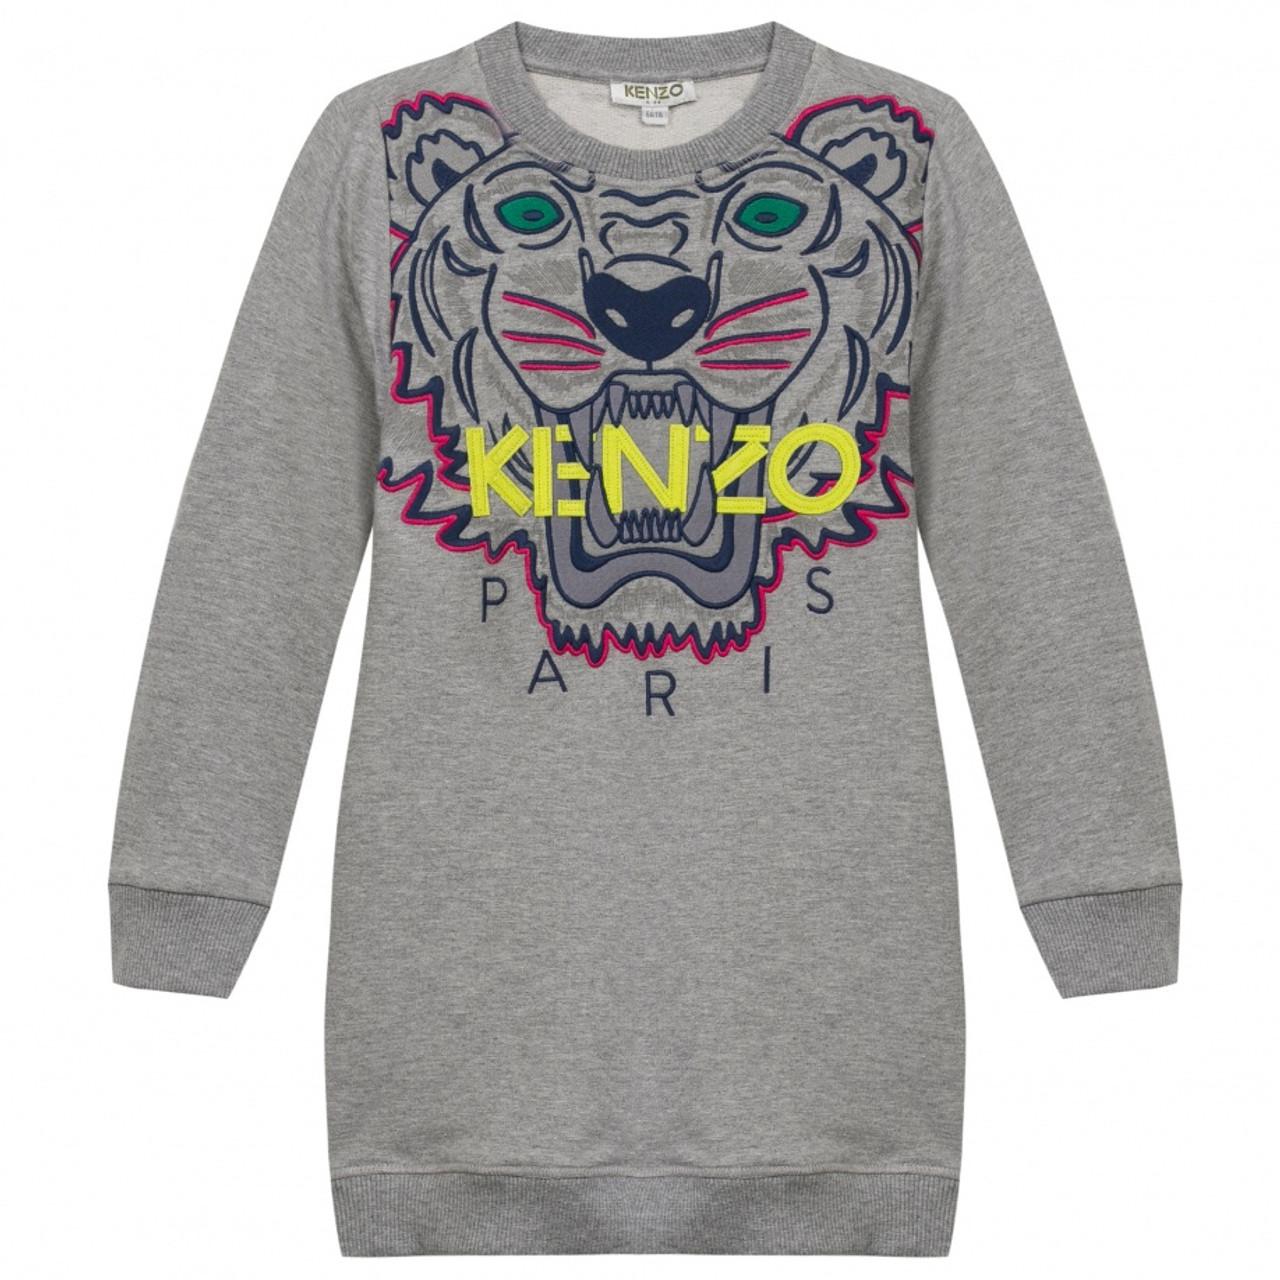 1e6a84210d7c Kenzo Girls Dress kg30185 - Le Petit Kids